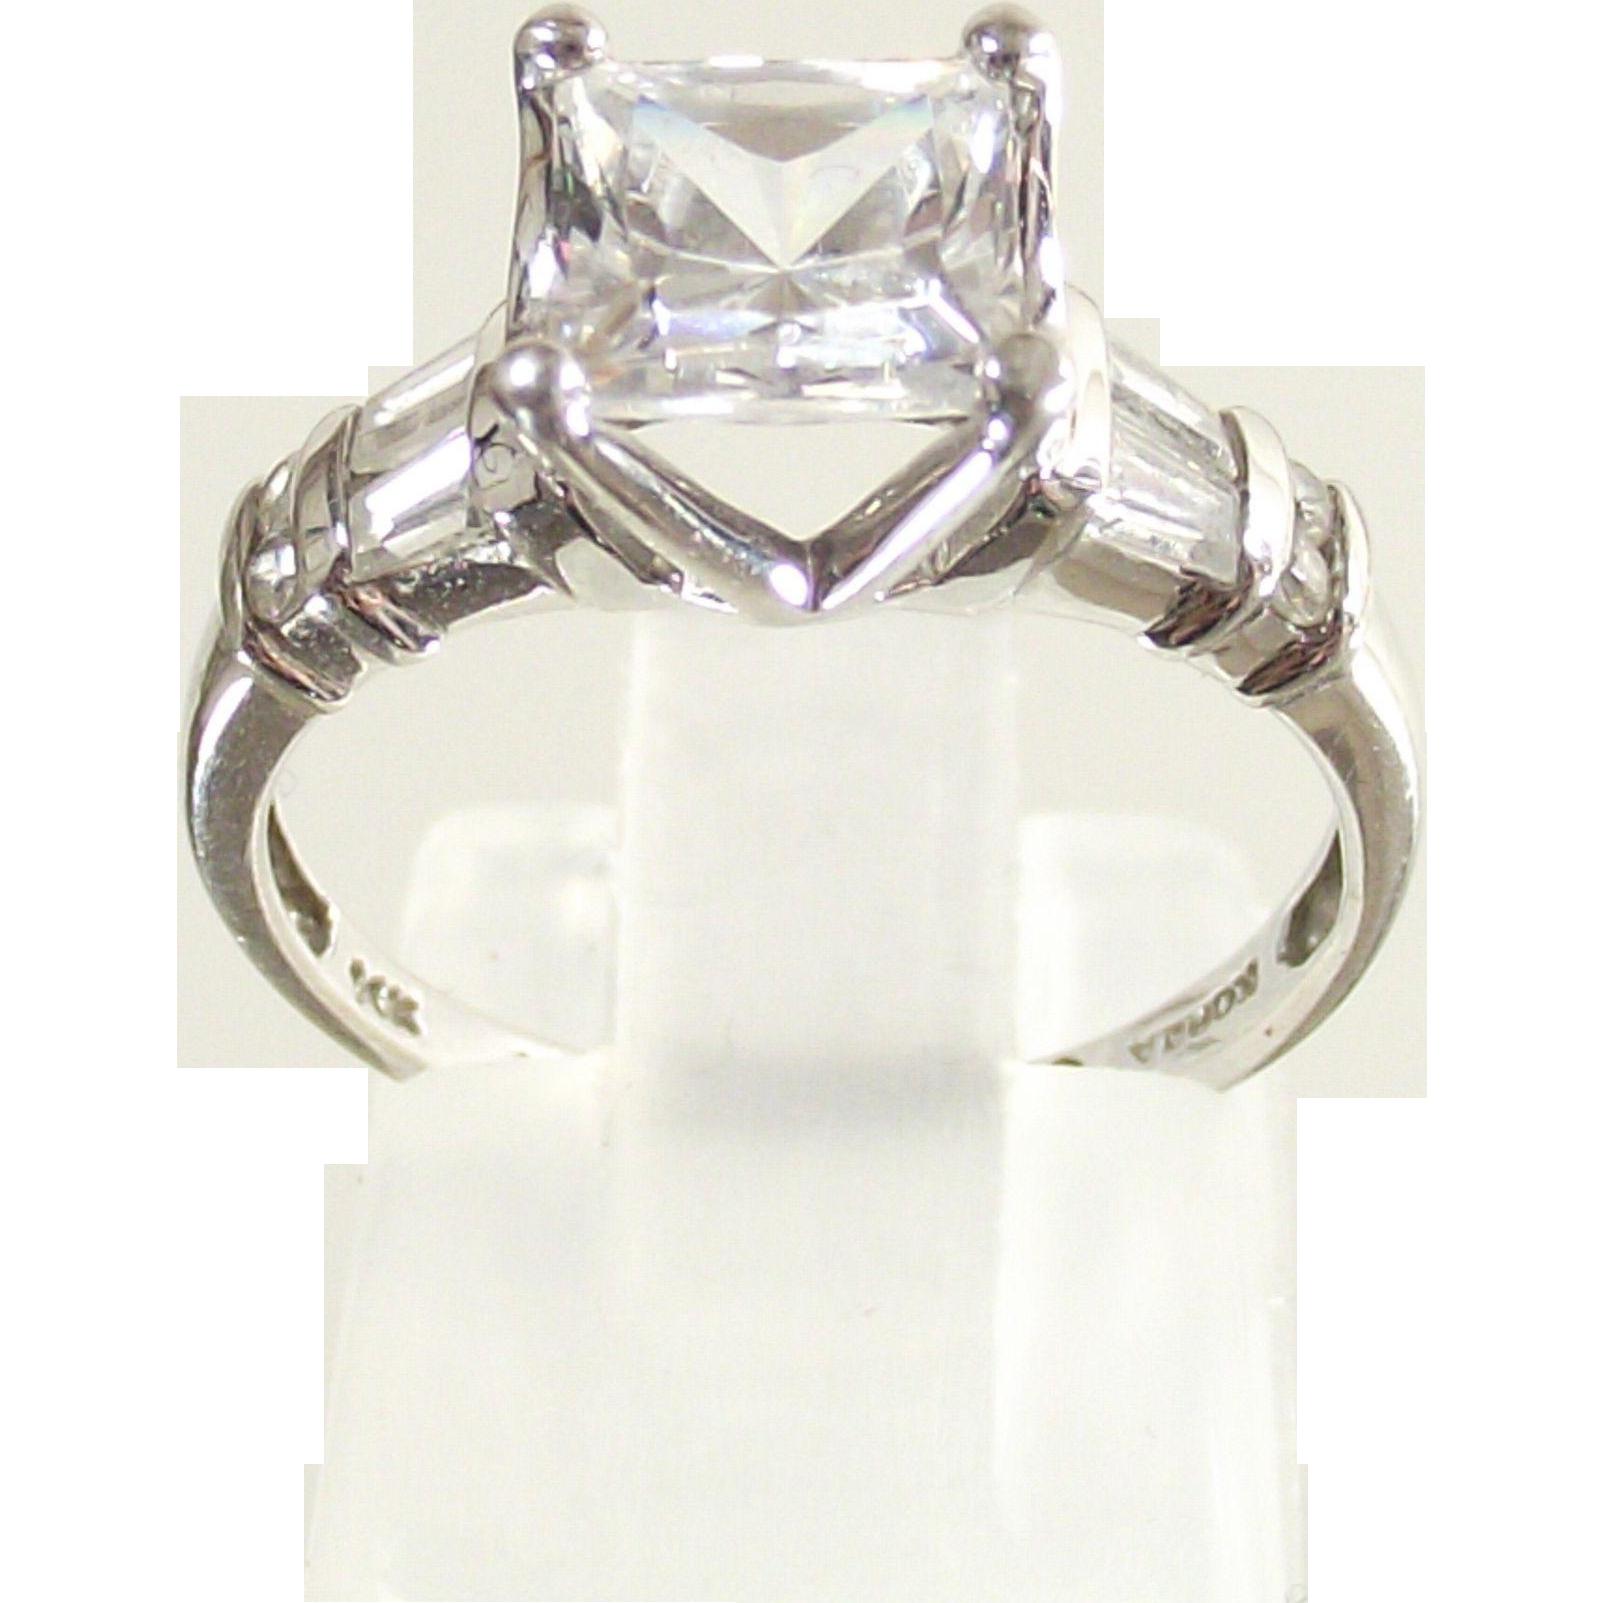 Vintage 14 Kt. White Gold  Ring sz six   Princess Cut  Rounds  and  Baguette  CZs.